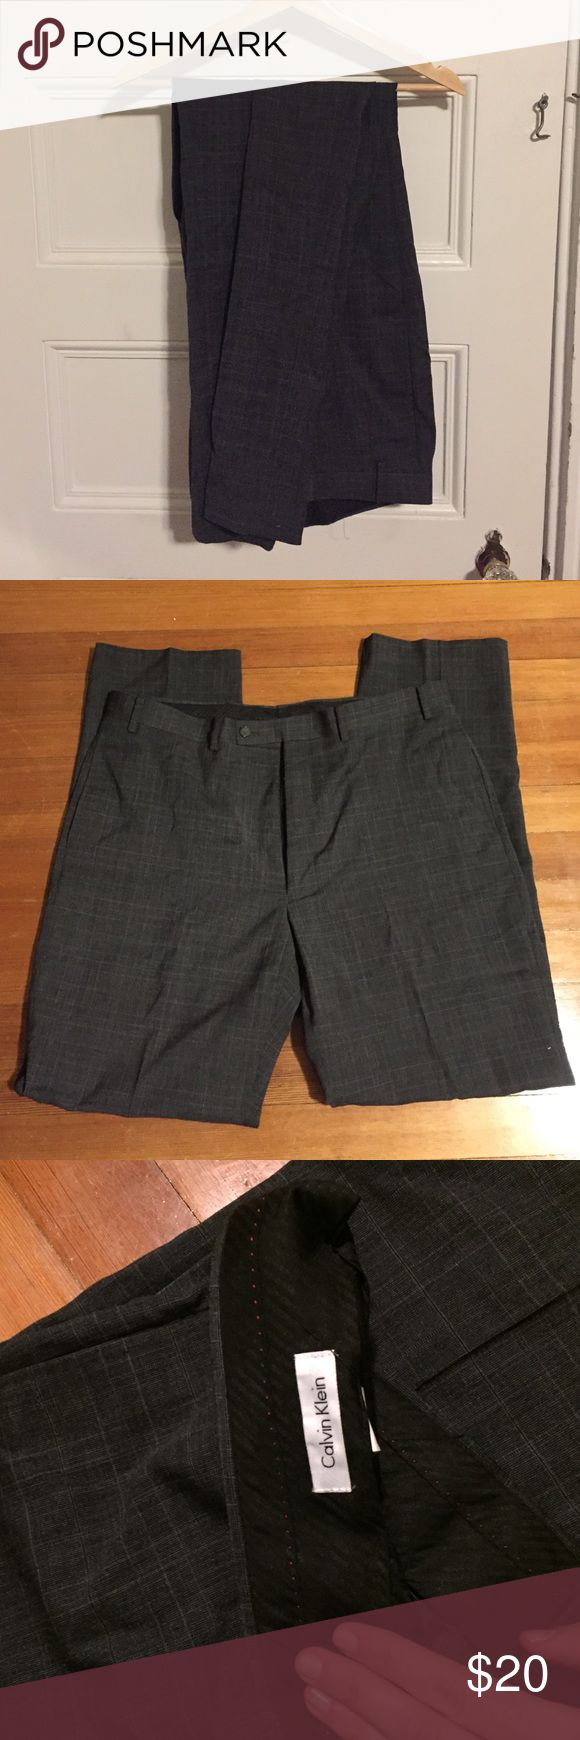 Men's grey dress pants Dark grey men's dress pants. Lovely sleek patterning. Great condition. Calvin Klein Pants Dress